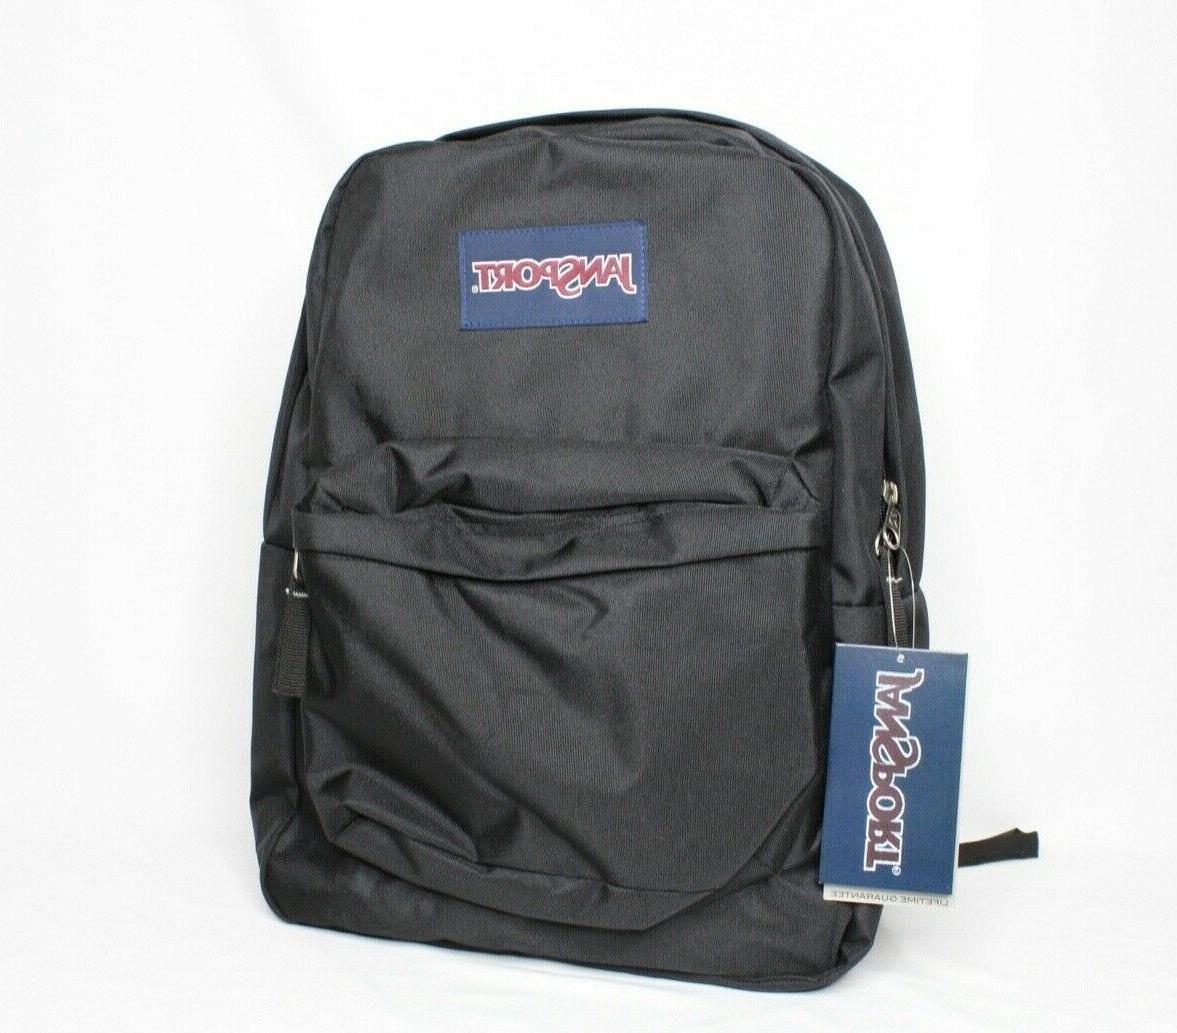 JanSport Bagpack Nwt